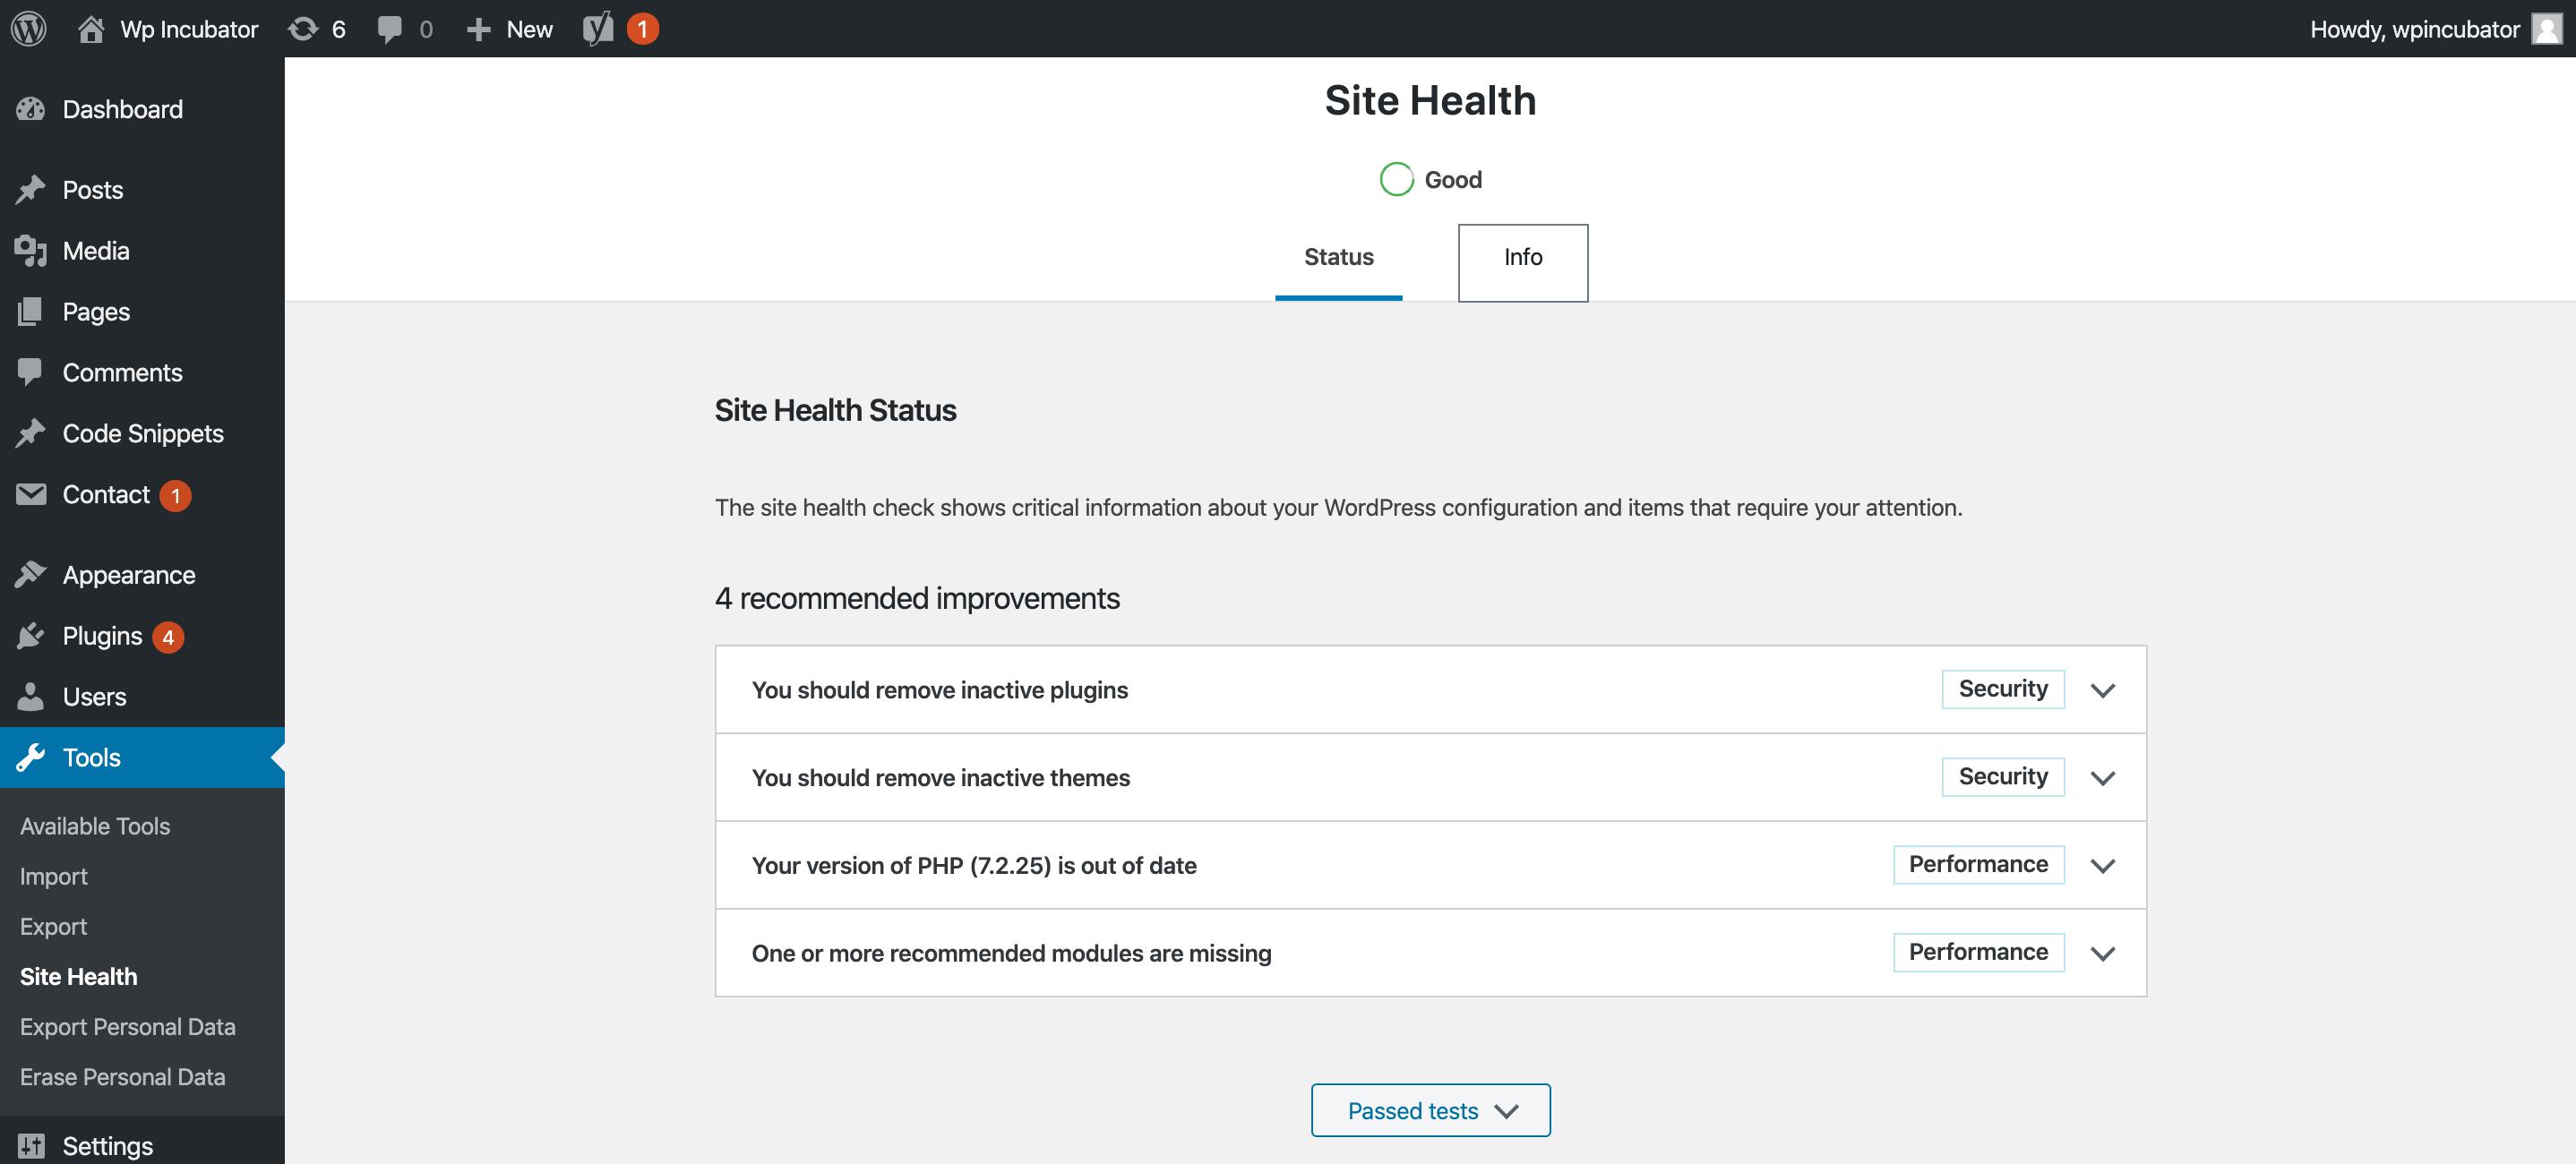 WP Incubator site health check wp 5.3